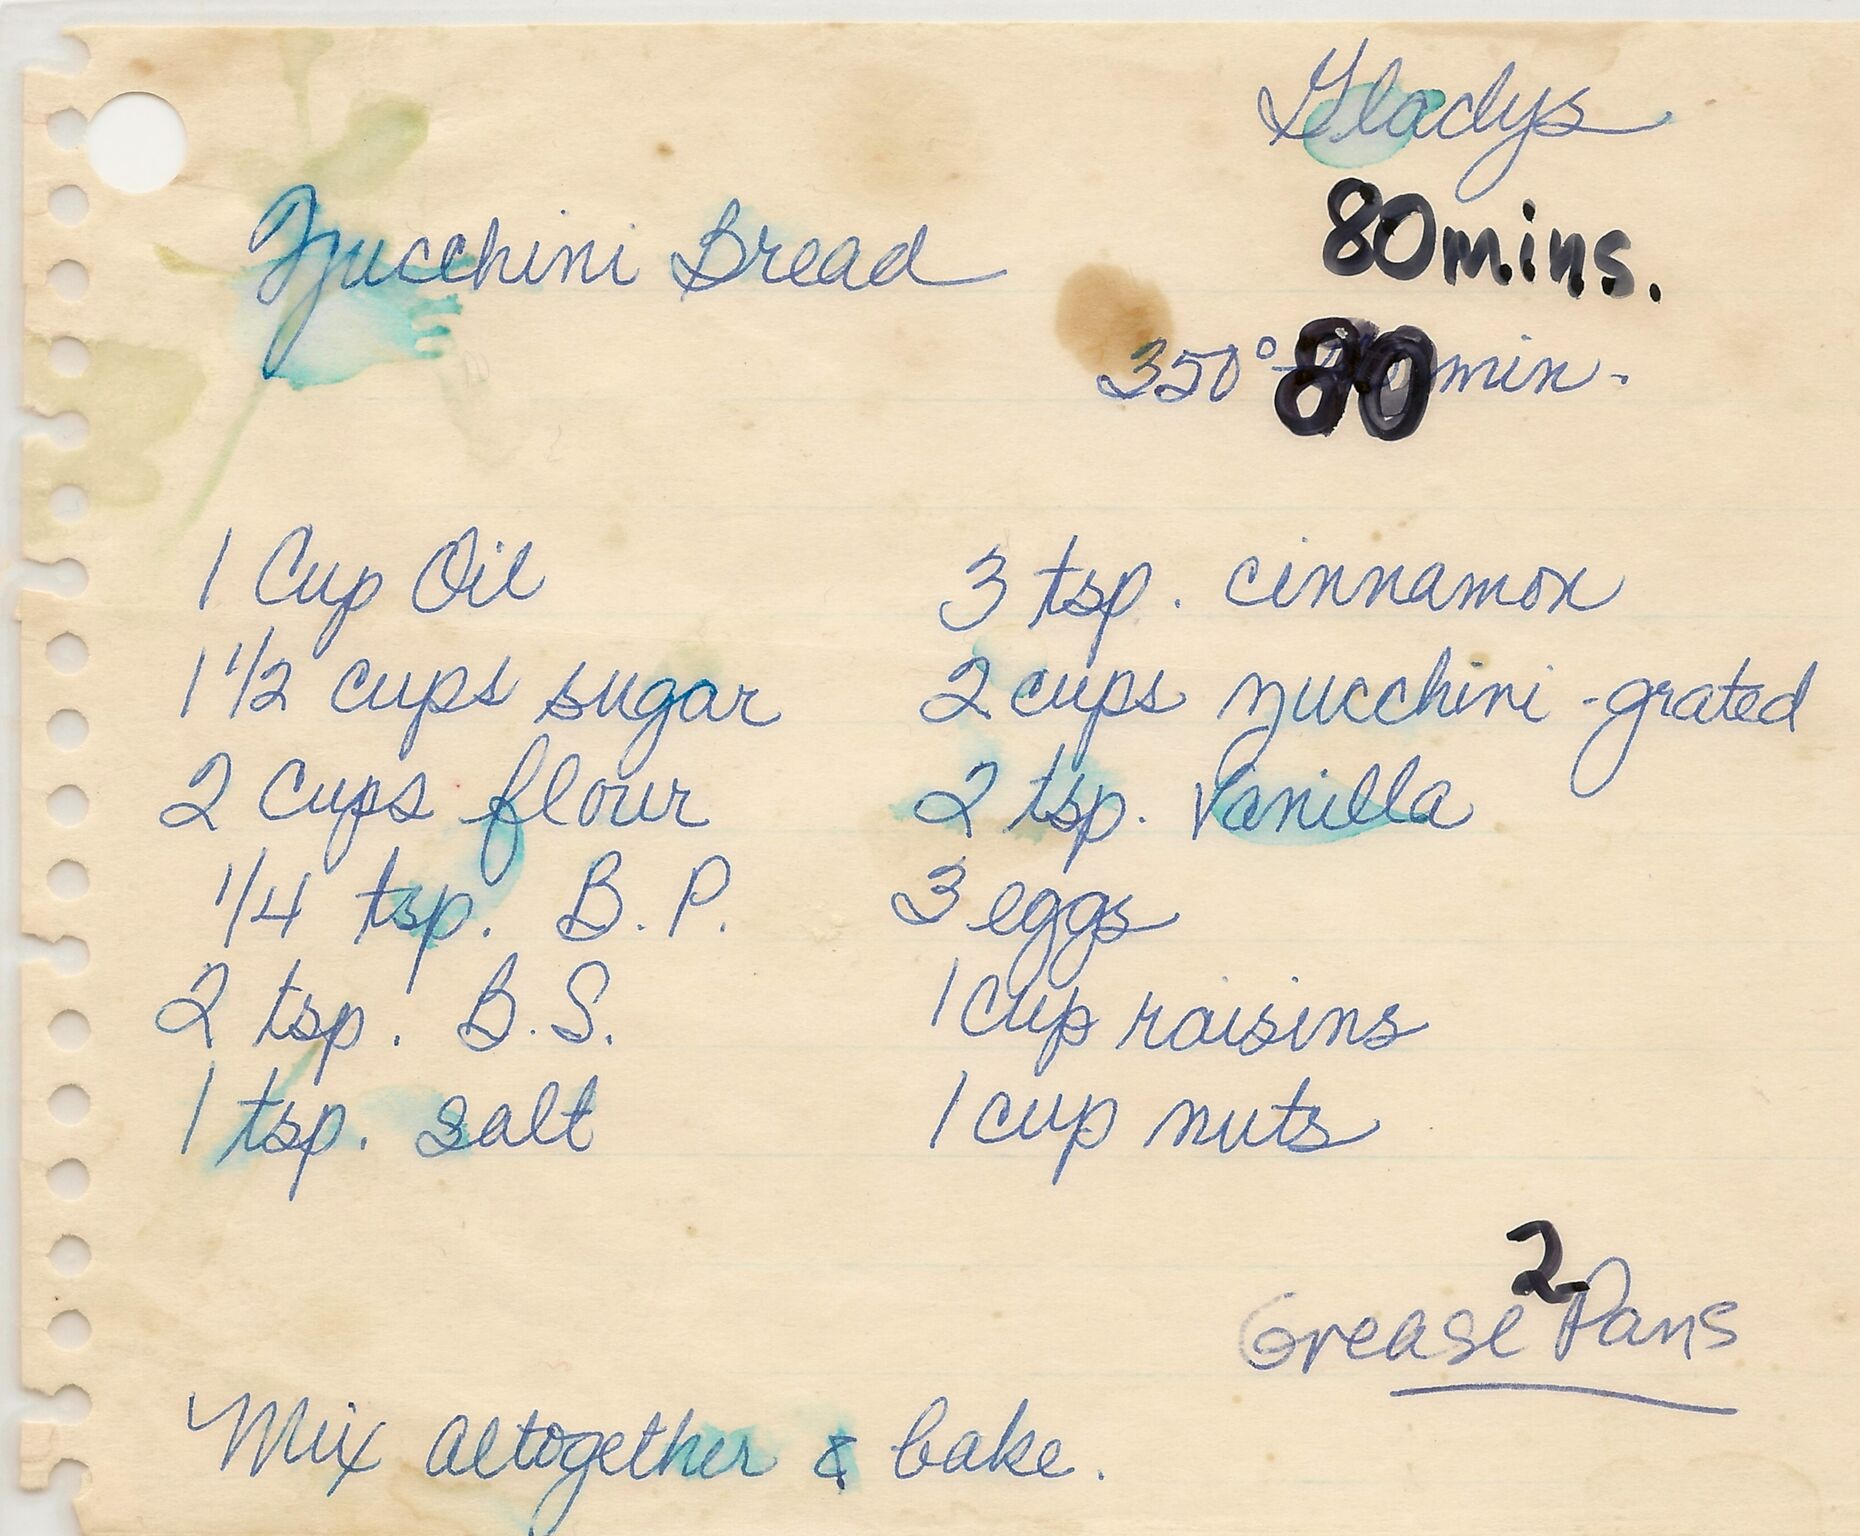 Aunty Gladys' Zucchini Bread